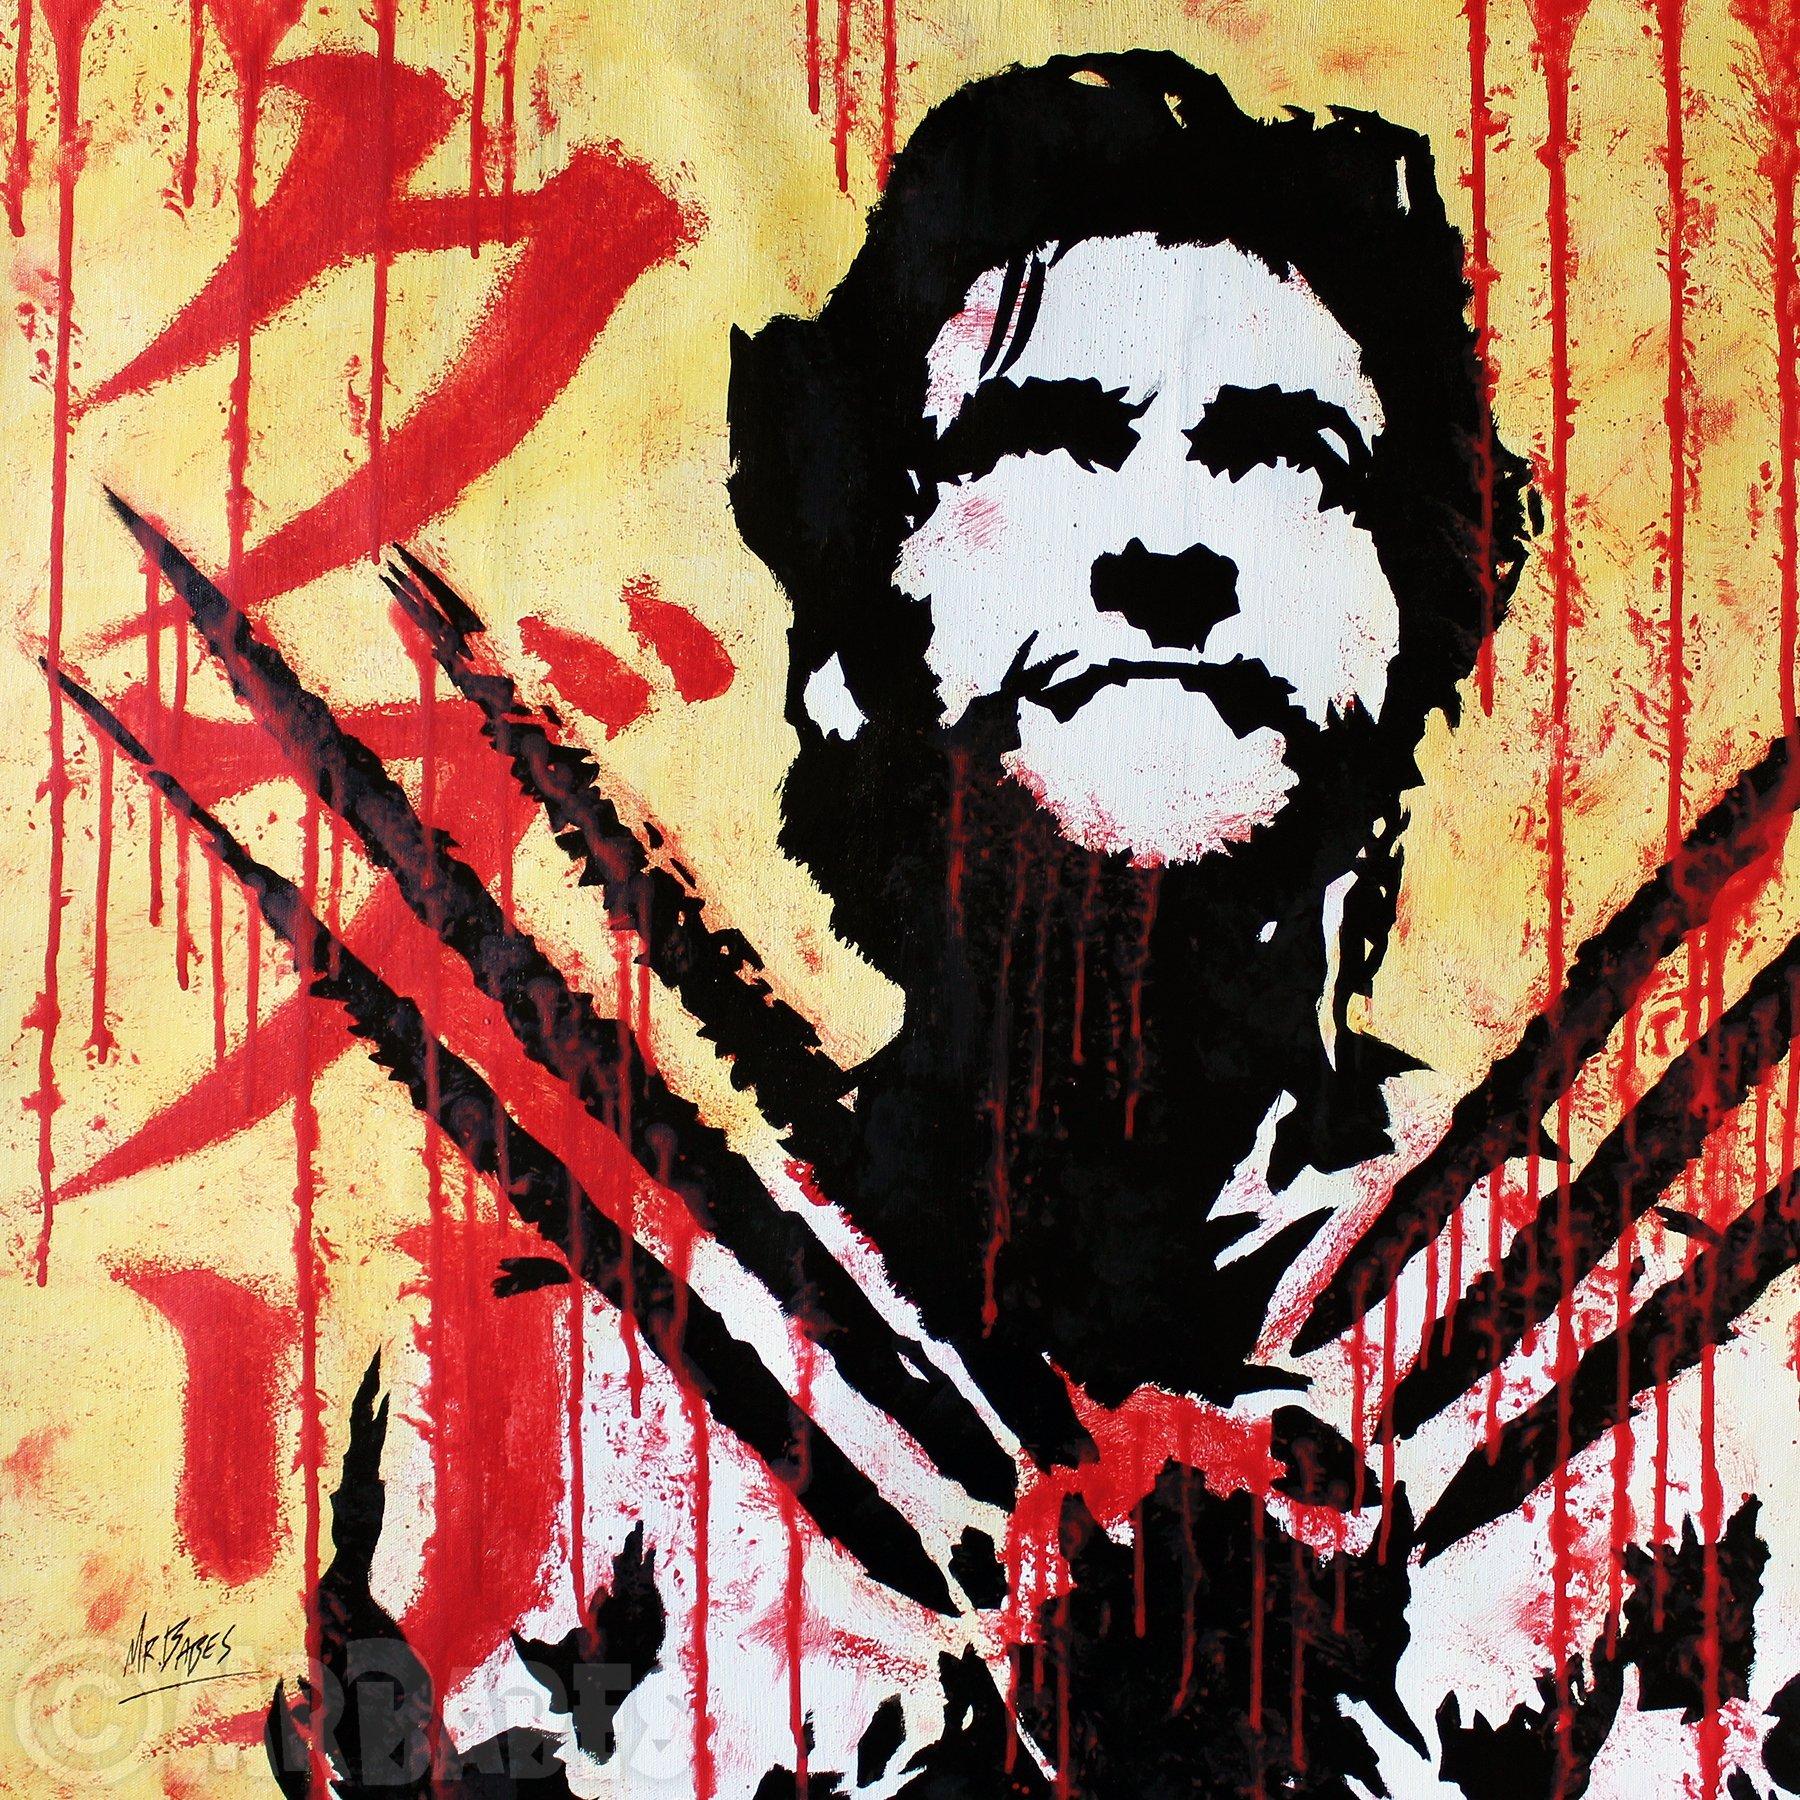 MR.BABES - ''Logan/X-Men: The Wolverine (Hugh Jackman)'' - Original Pop Art Painting - Comic Book Movie Portrait